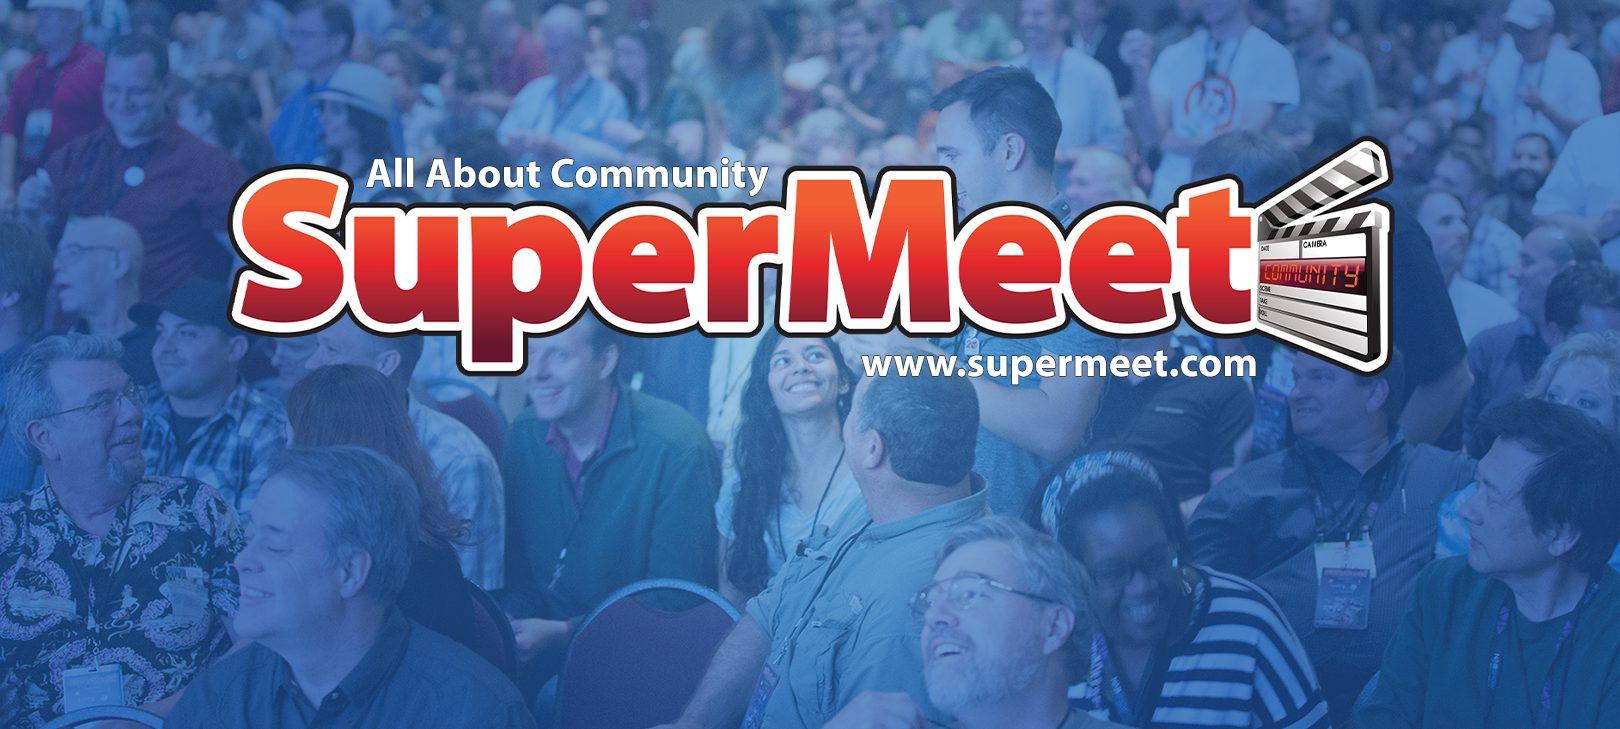 The Supermeet returns to Boston this November